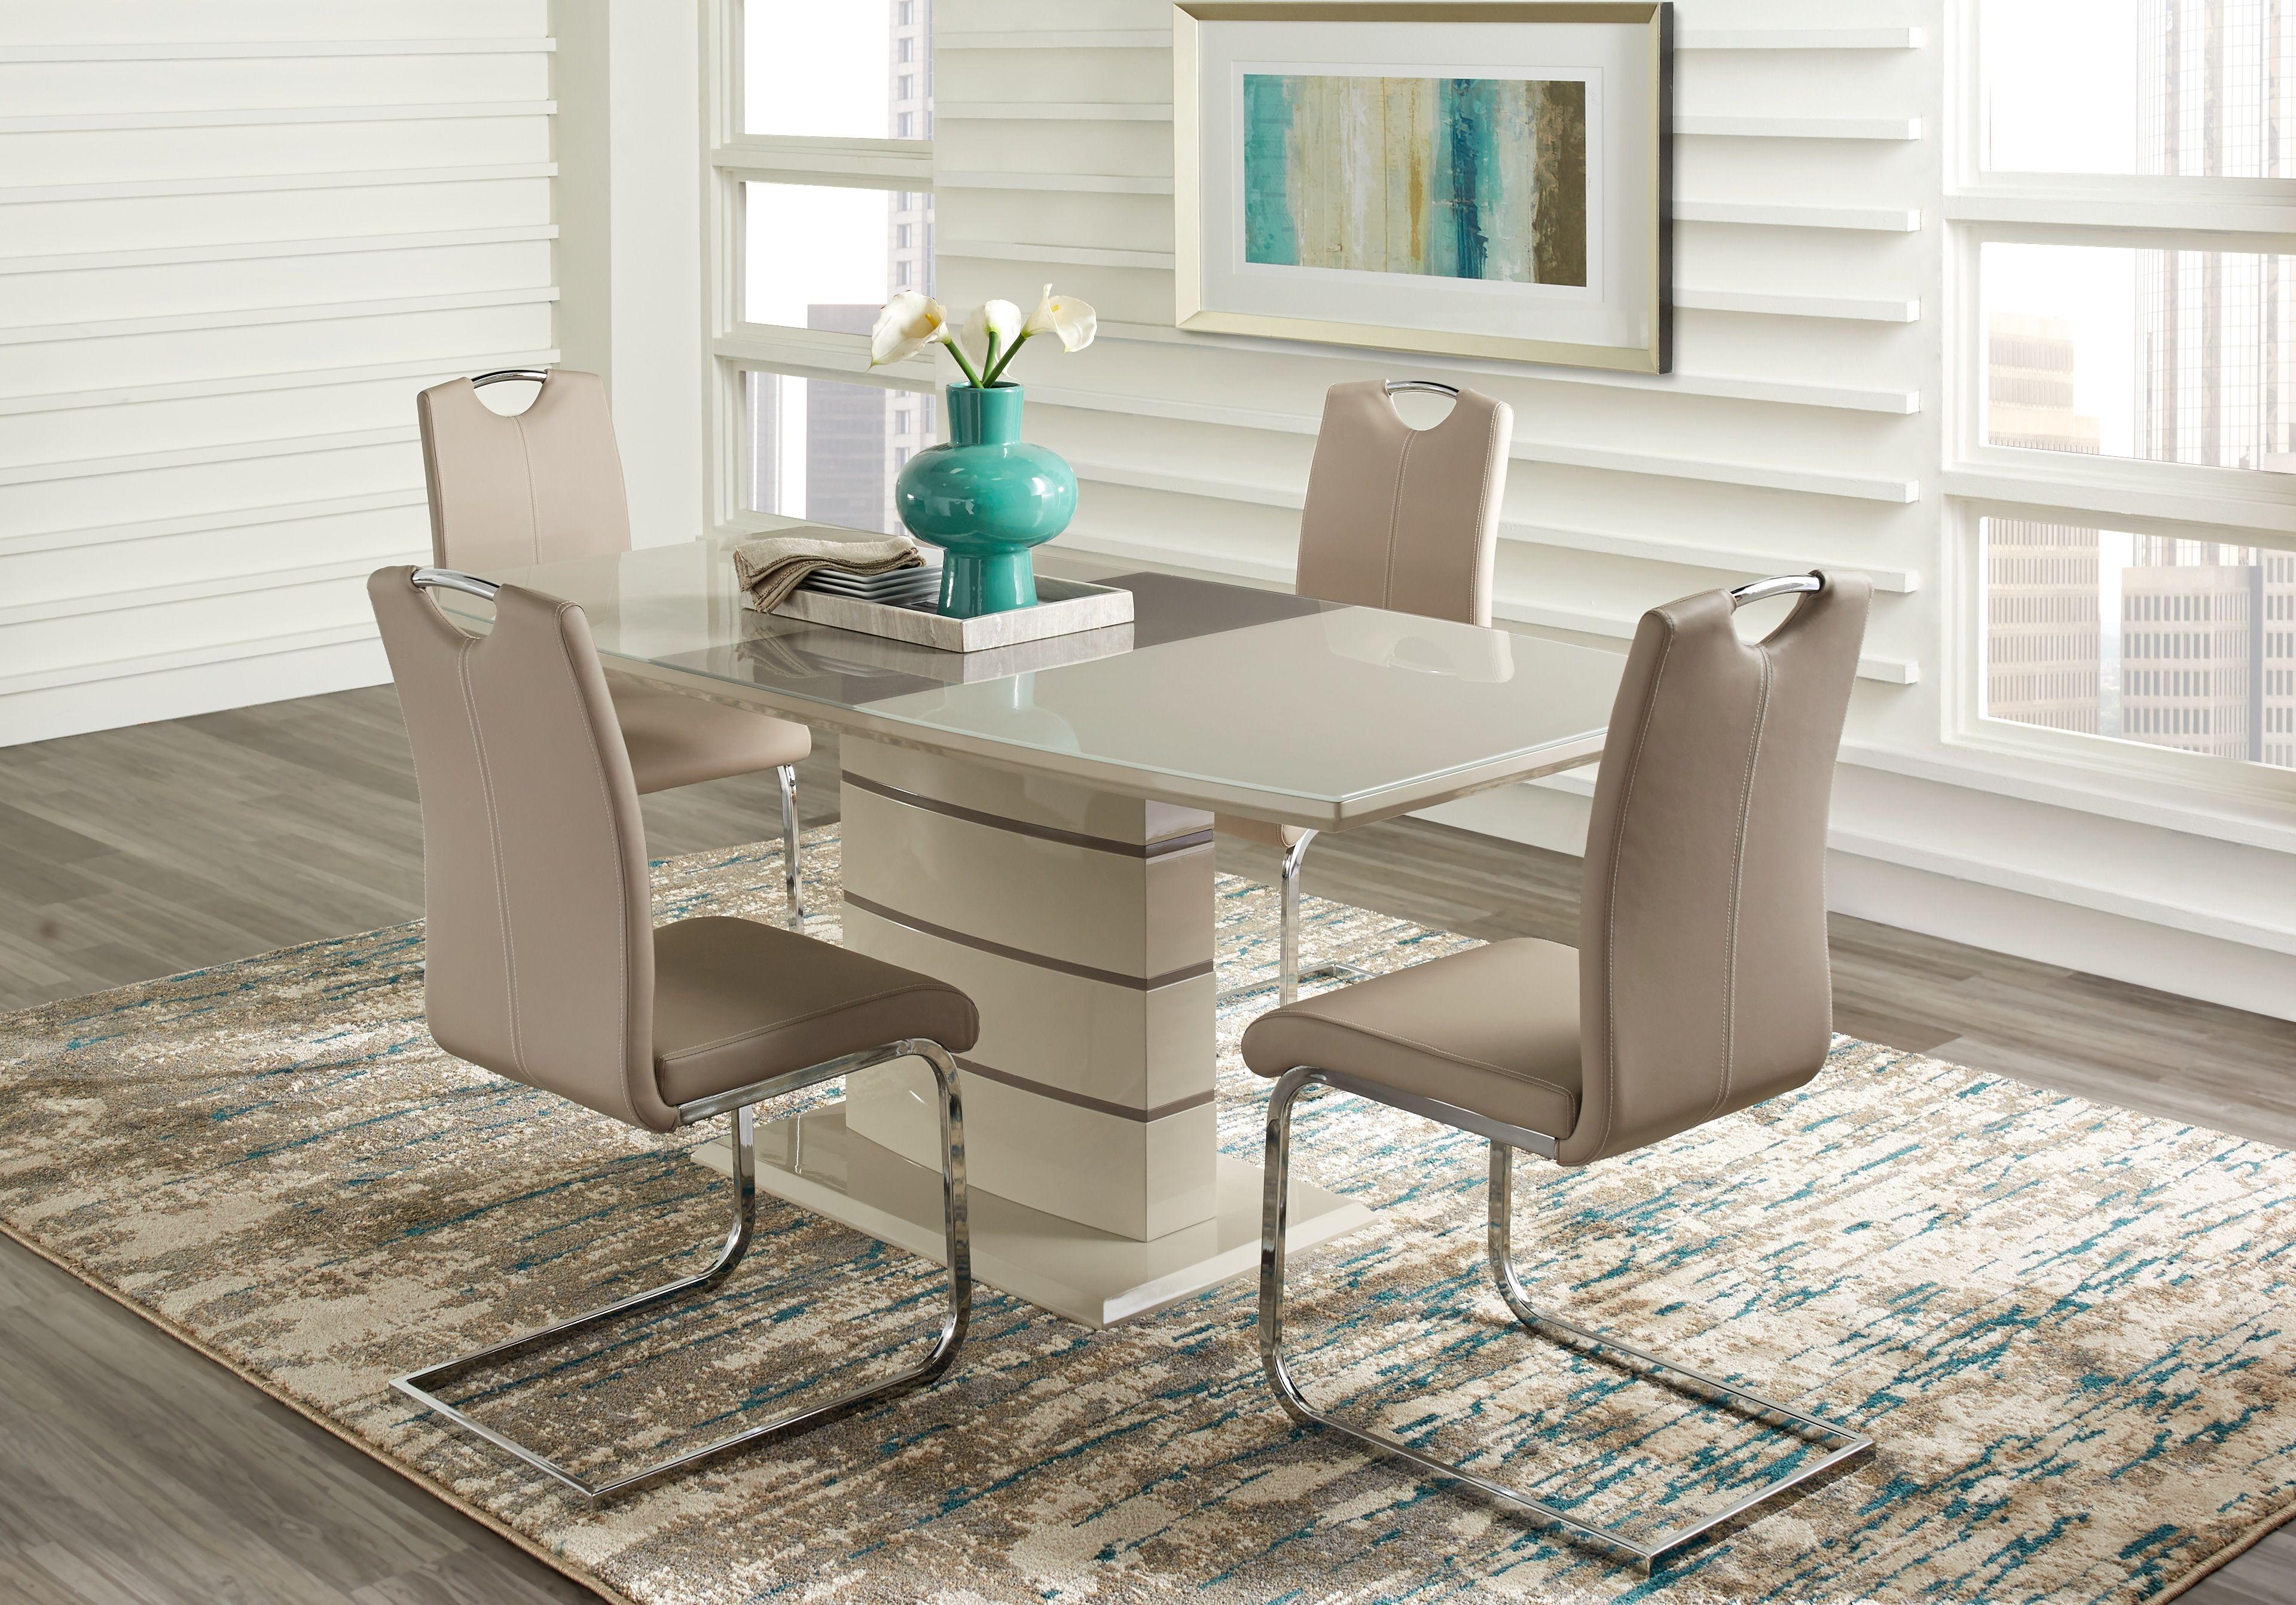 Bay Ridge Champagne 5 Pc Dining Room Dining Room Sets Dining Room Table Chairs Dining Room Suites